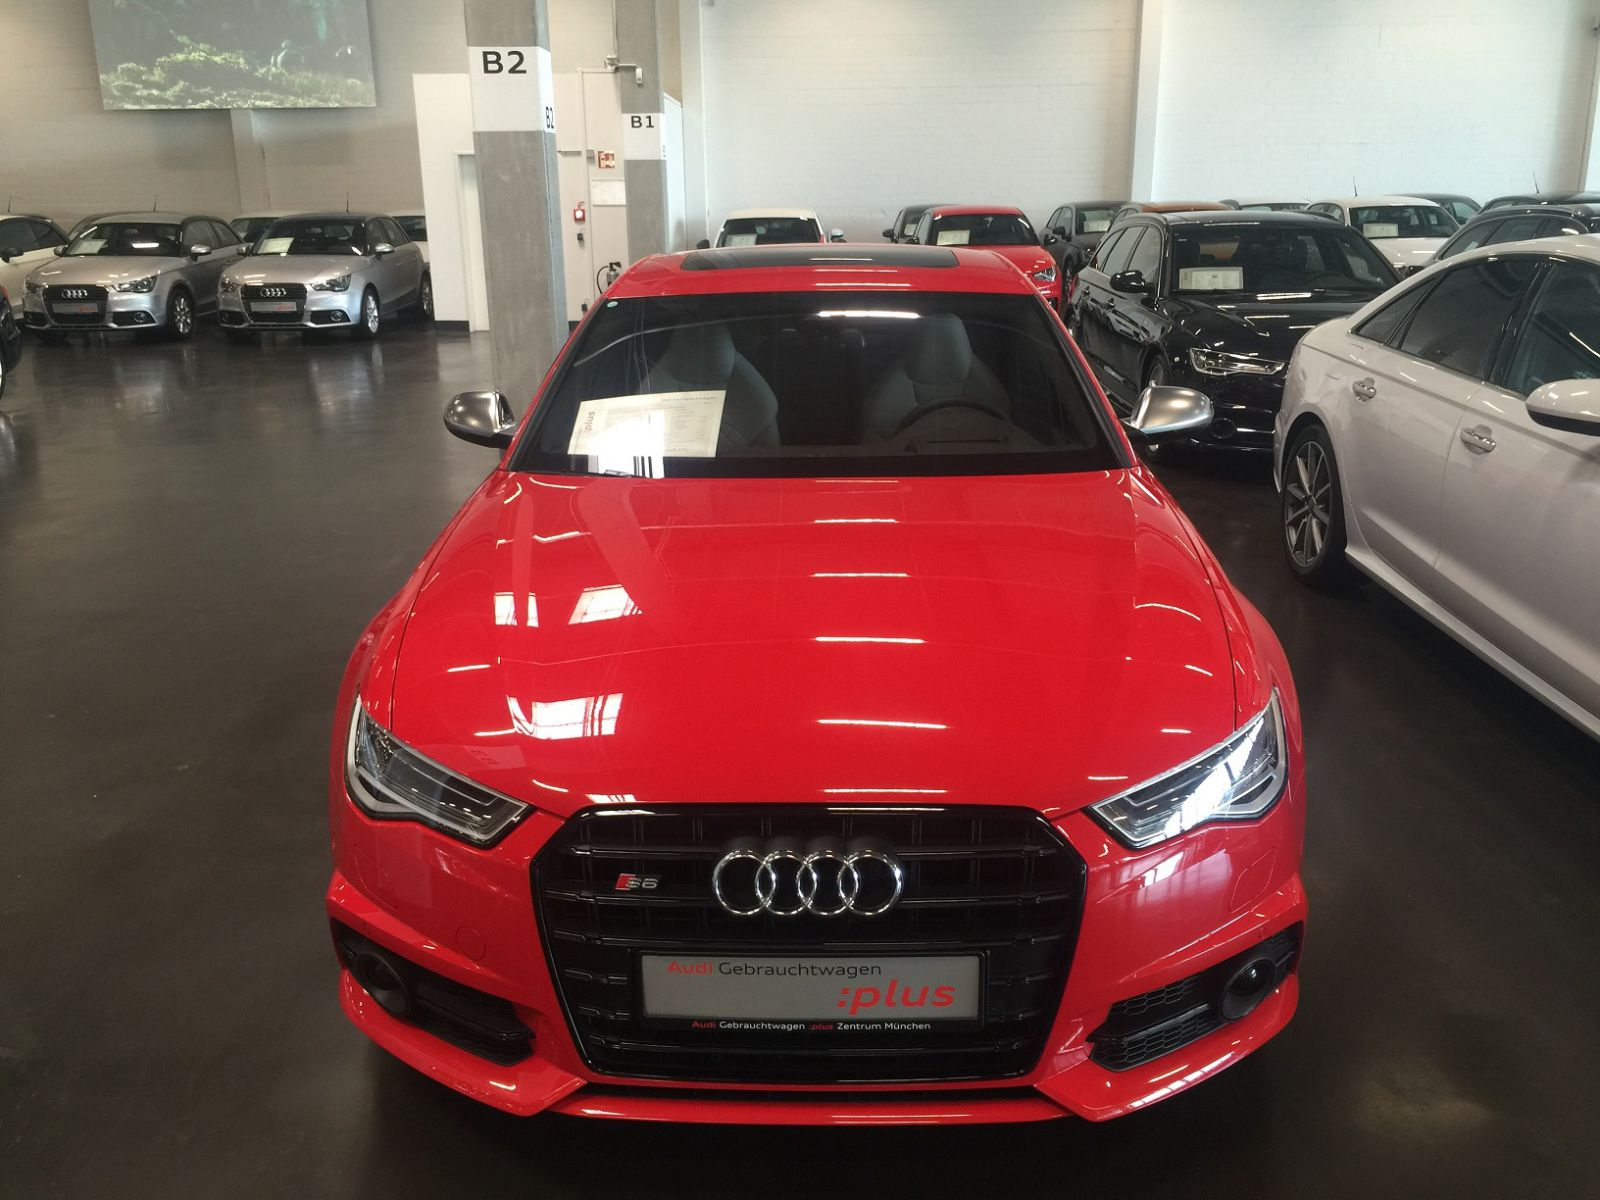 Audi Gebrauchtwagen :plus Zentrum - audi4ever